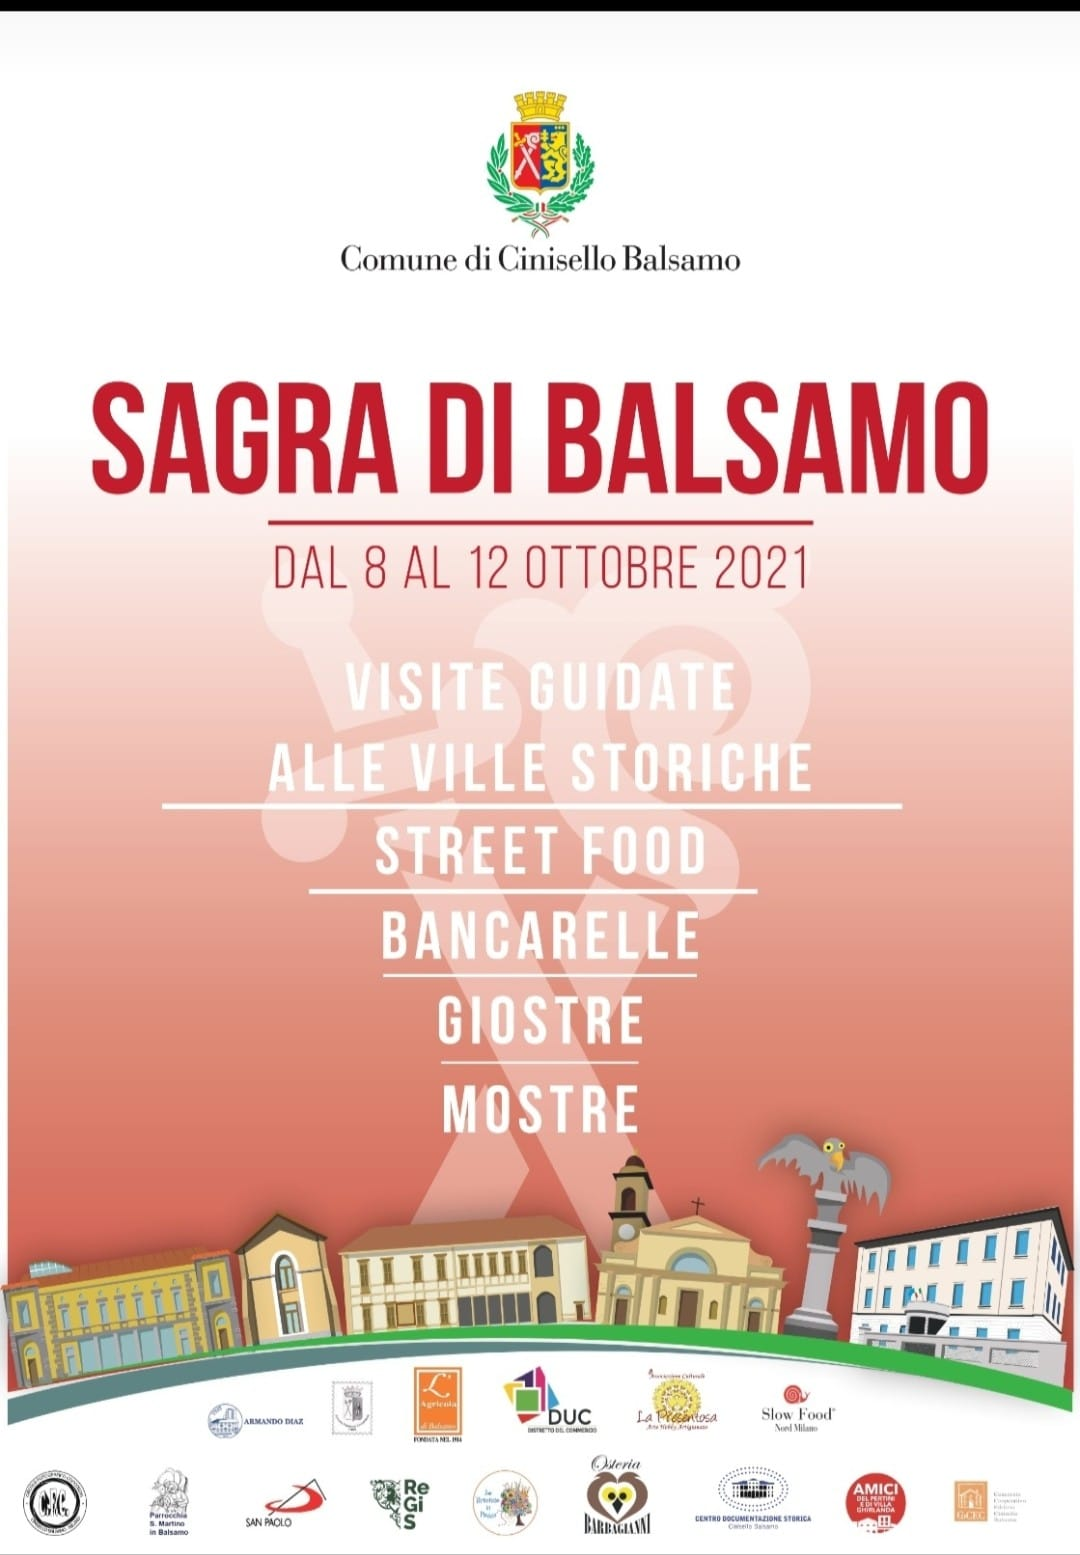 CINISELLO BALSAMO (MI): Sagra di Balsamo 2021